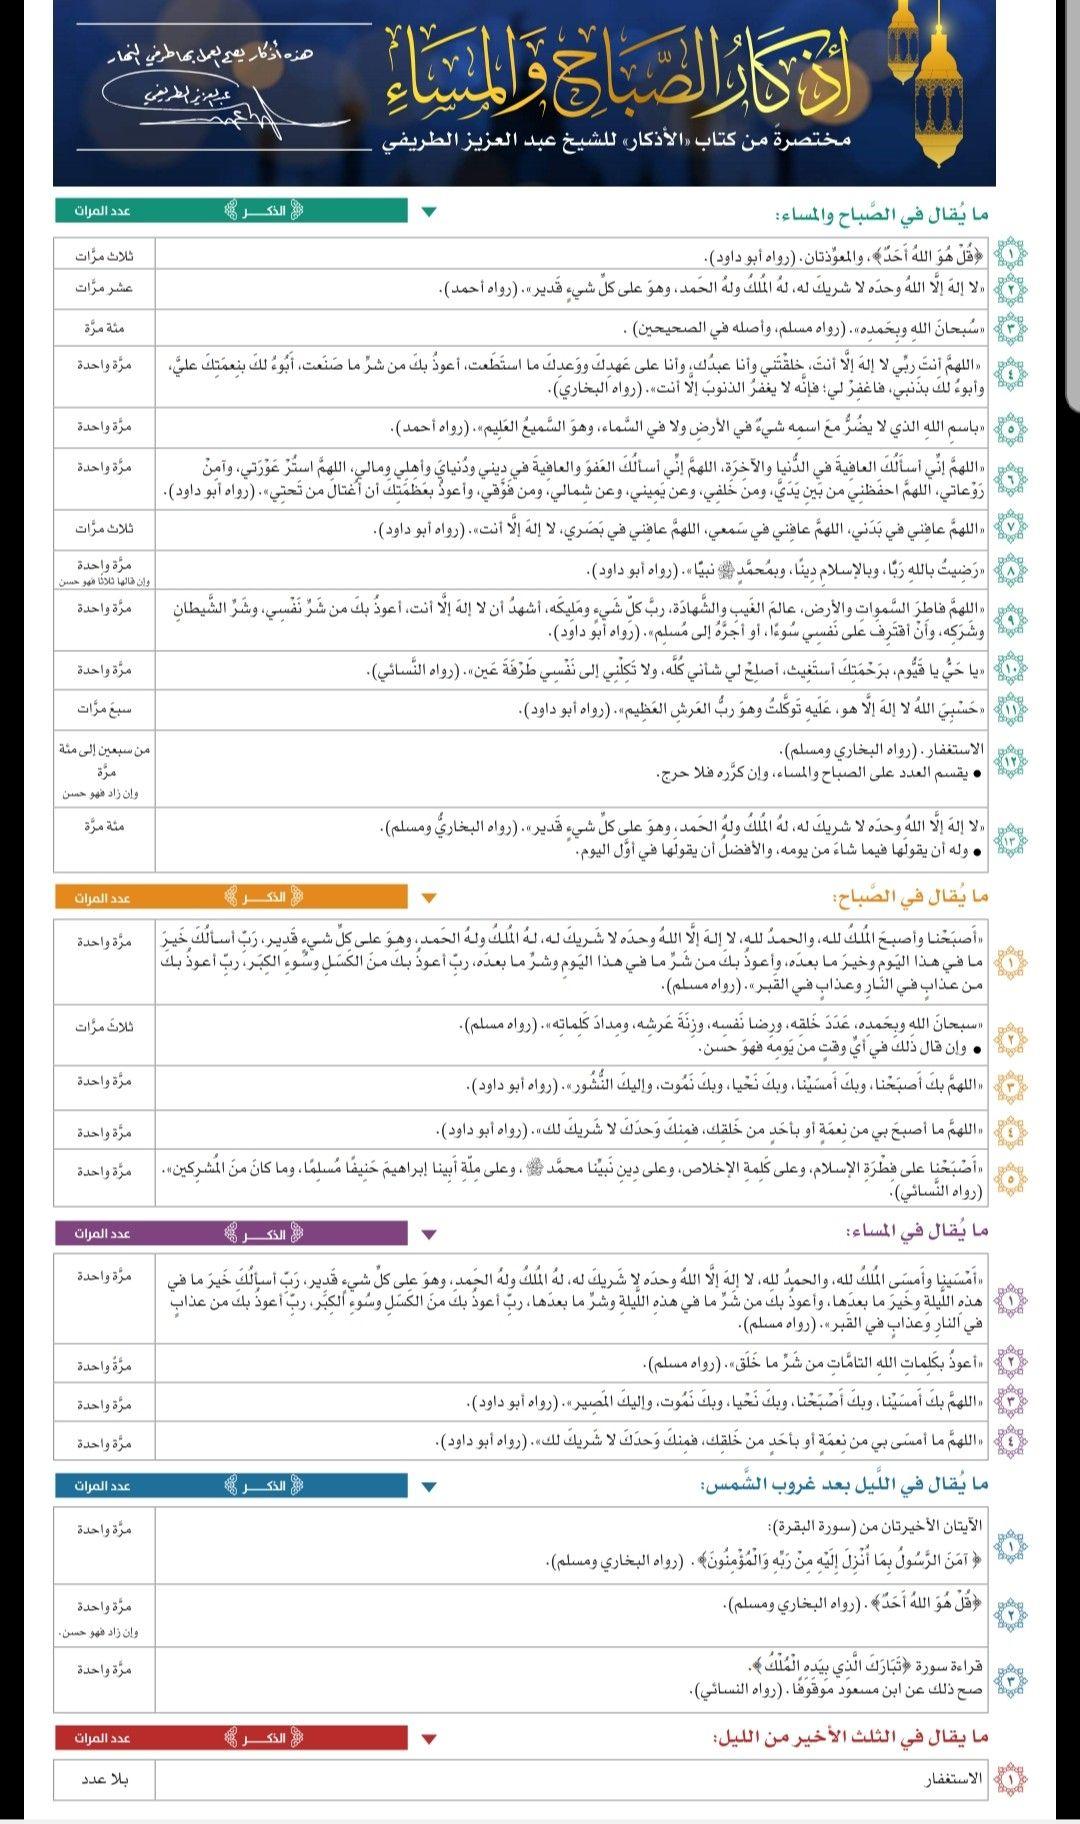 أذكار الصباح والمساء Iphone Wallpaper Images Islamic Teachings Quran Quotes